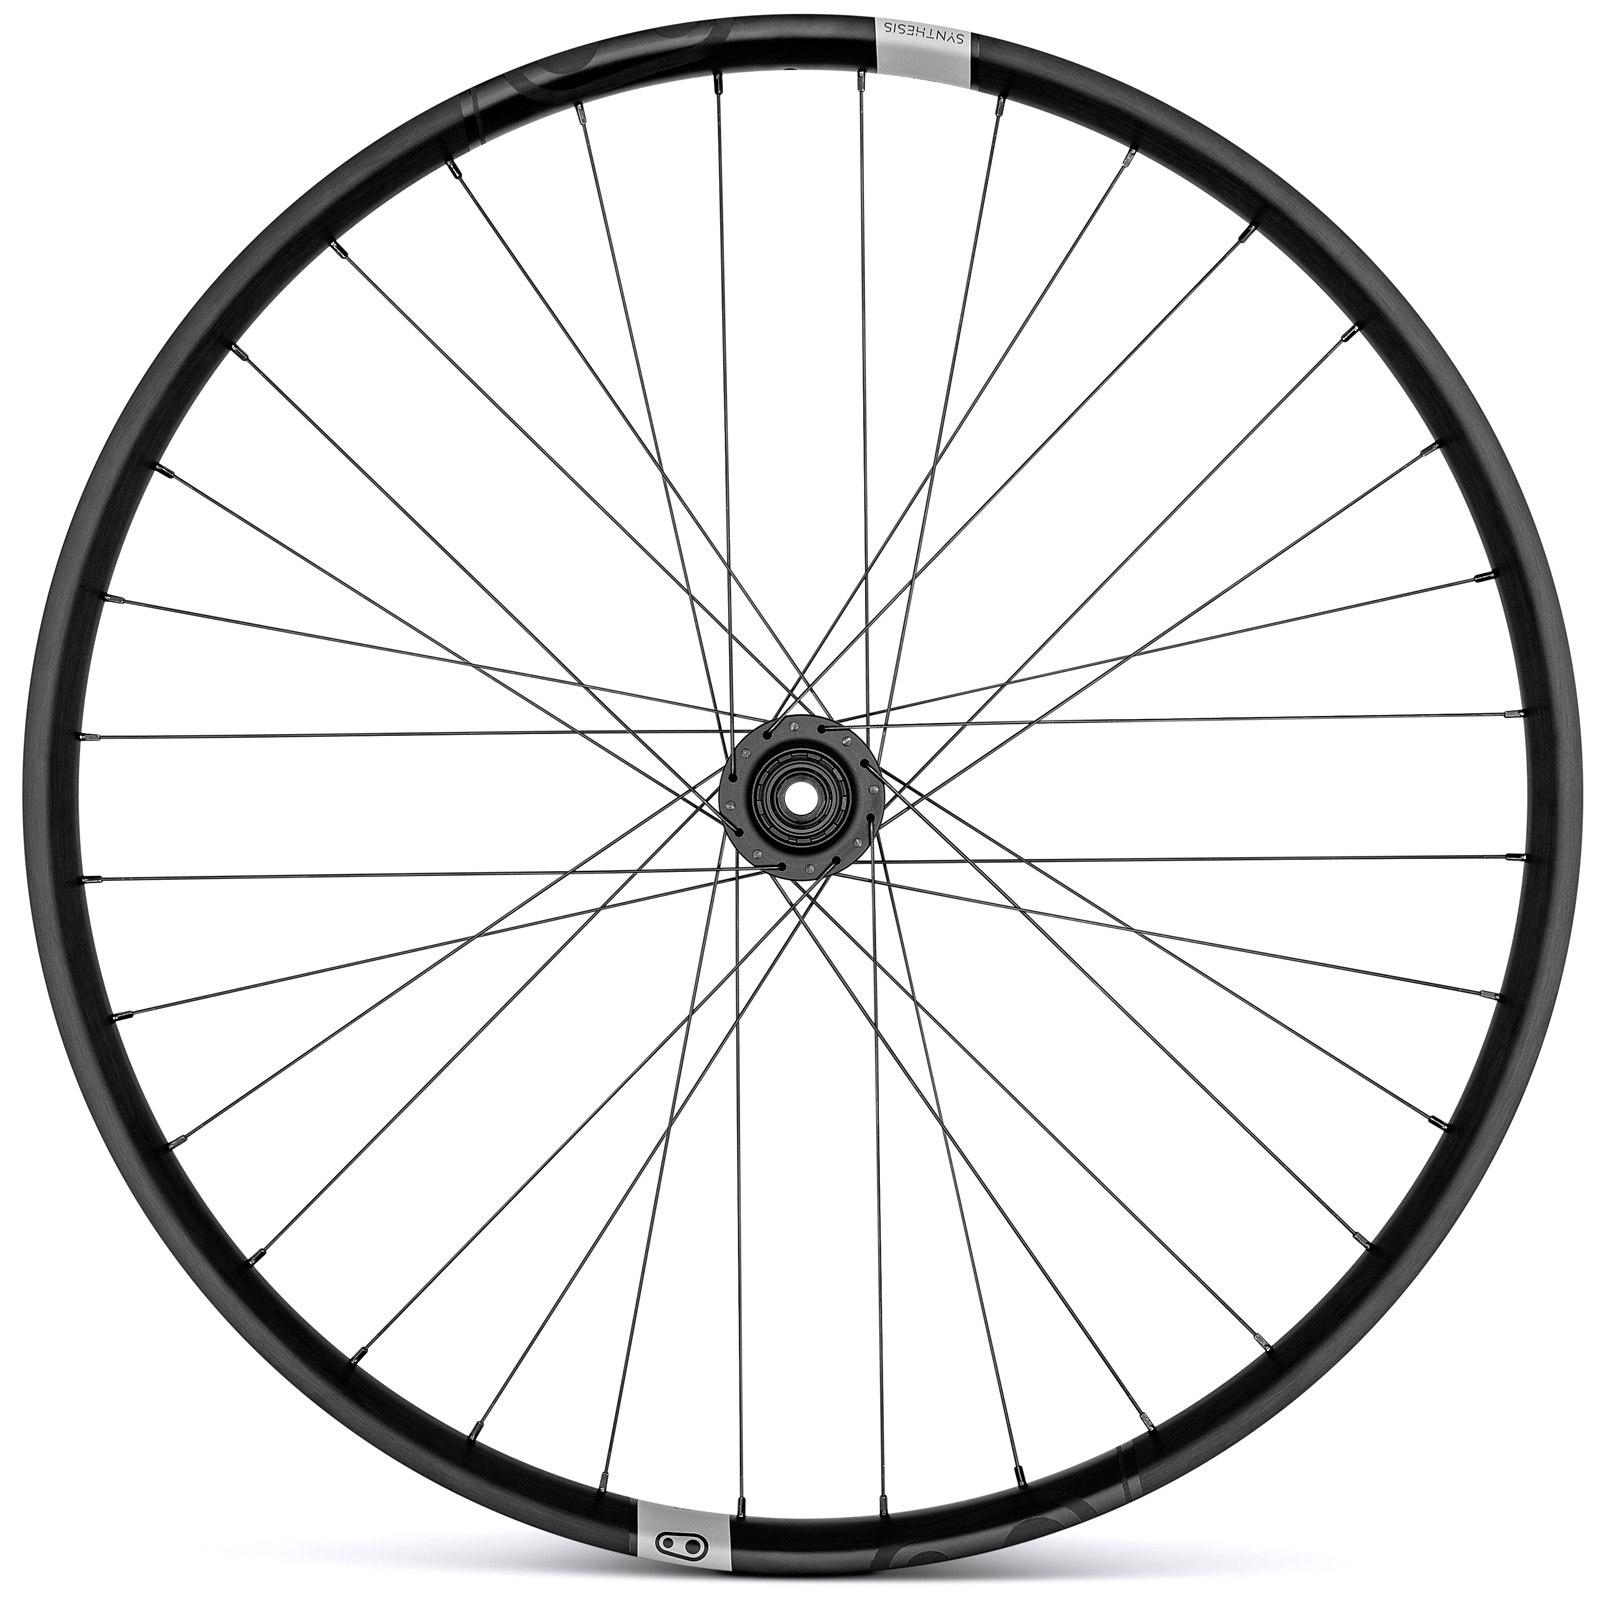 Crankbrothers Synthesis E-MTB Alloy - 29 Inch Rear Wheel - SRAM XD - 6-Bolt - 12x148mm Boost